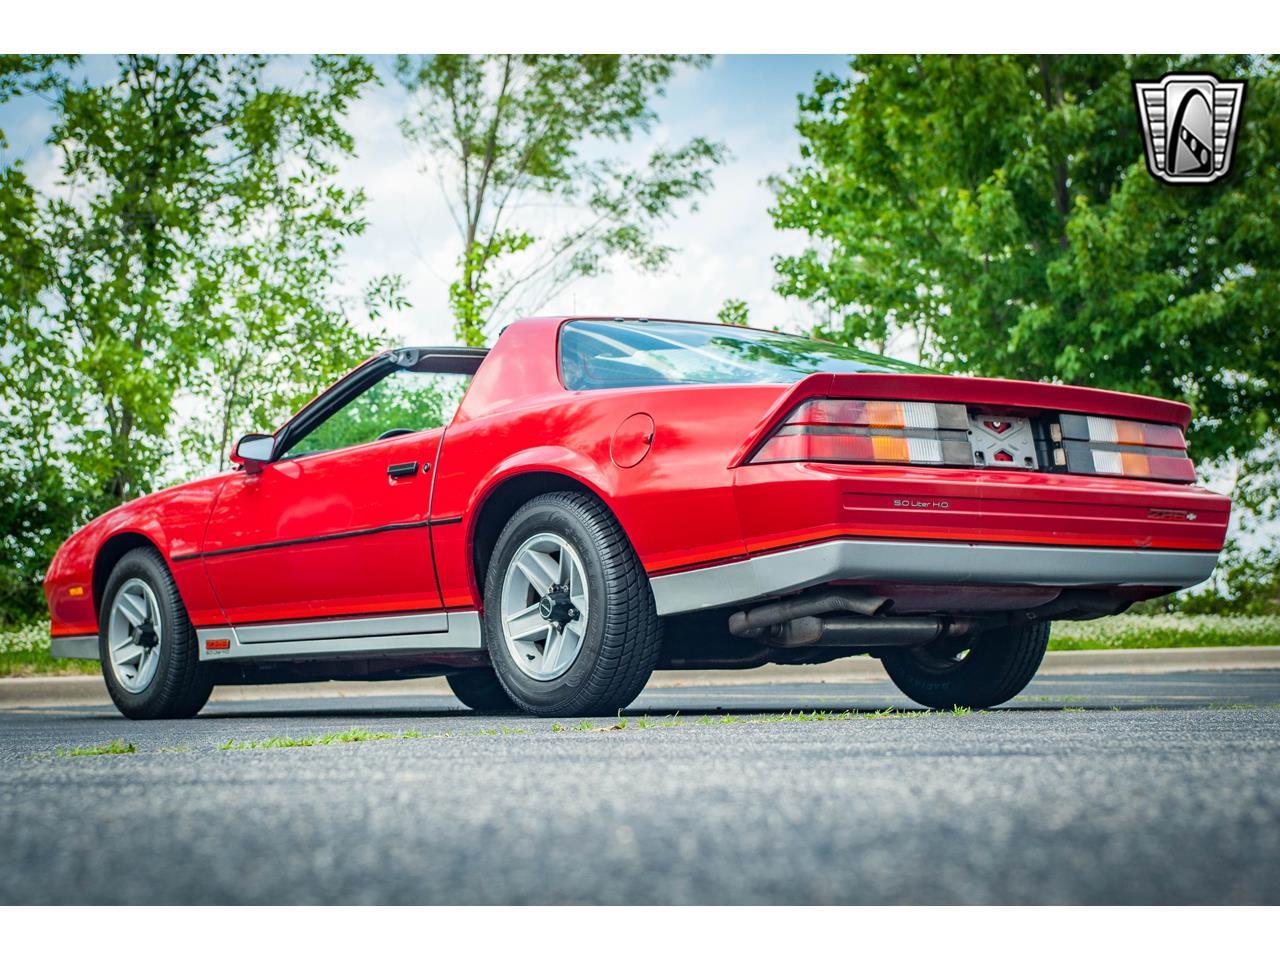 Large Picture of '84 Chevrolet Camaro - $9,500.00 - QB9Y